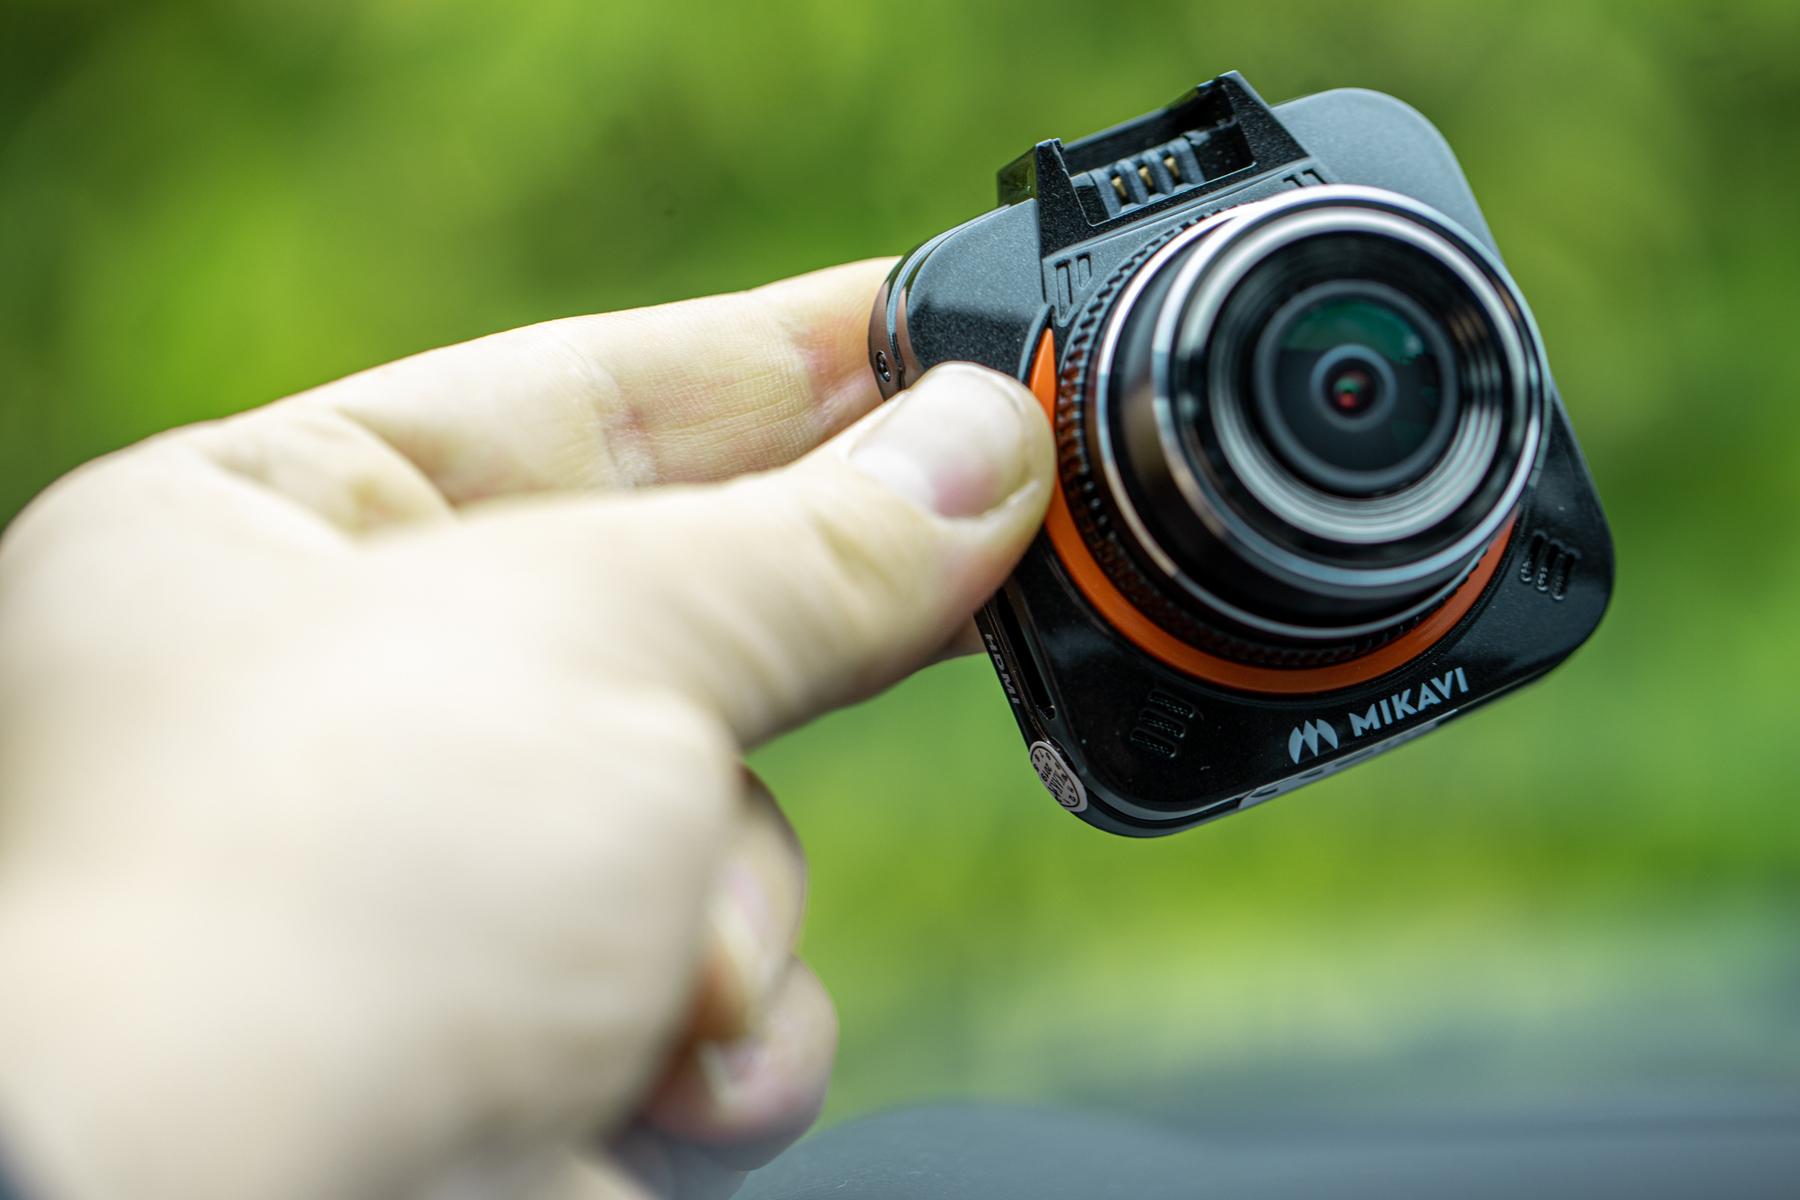 Mikavi wideorejestrator kamera samochodowa (7)